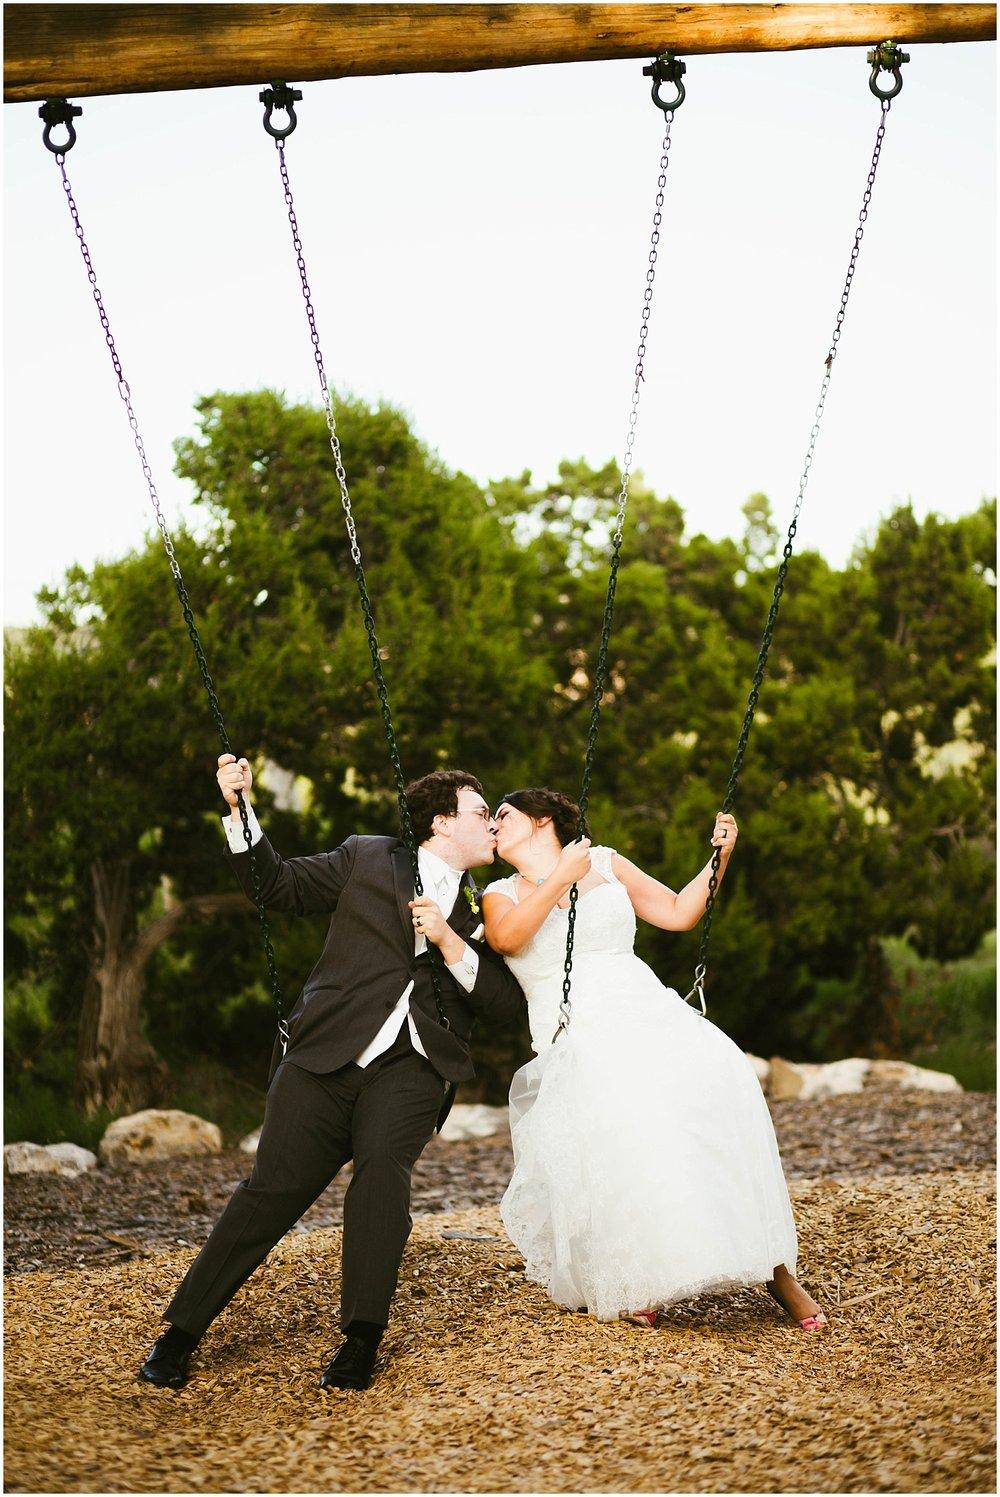 mallory-and-ryan-studio-ghibli-themed-nature-pointe-wedding_0052.jpg